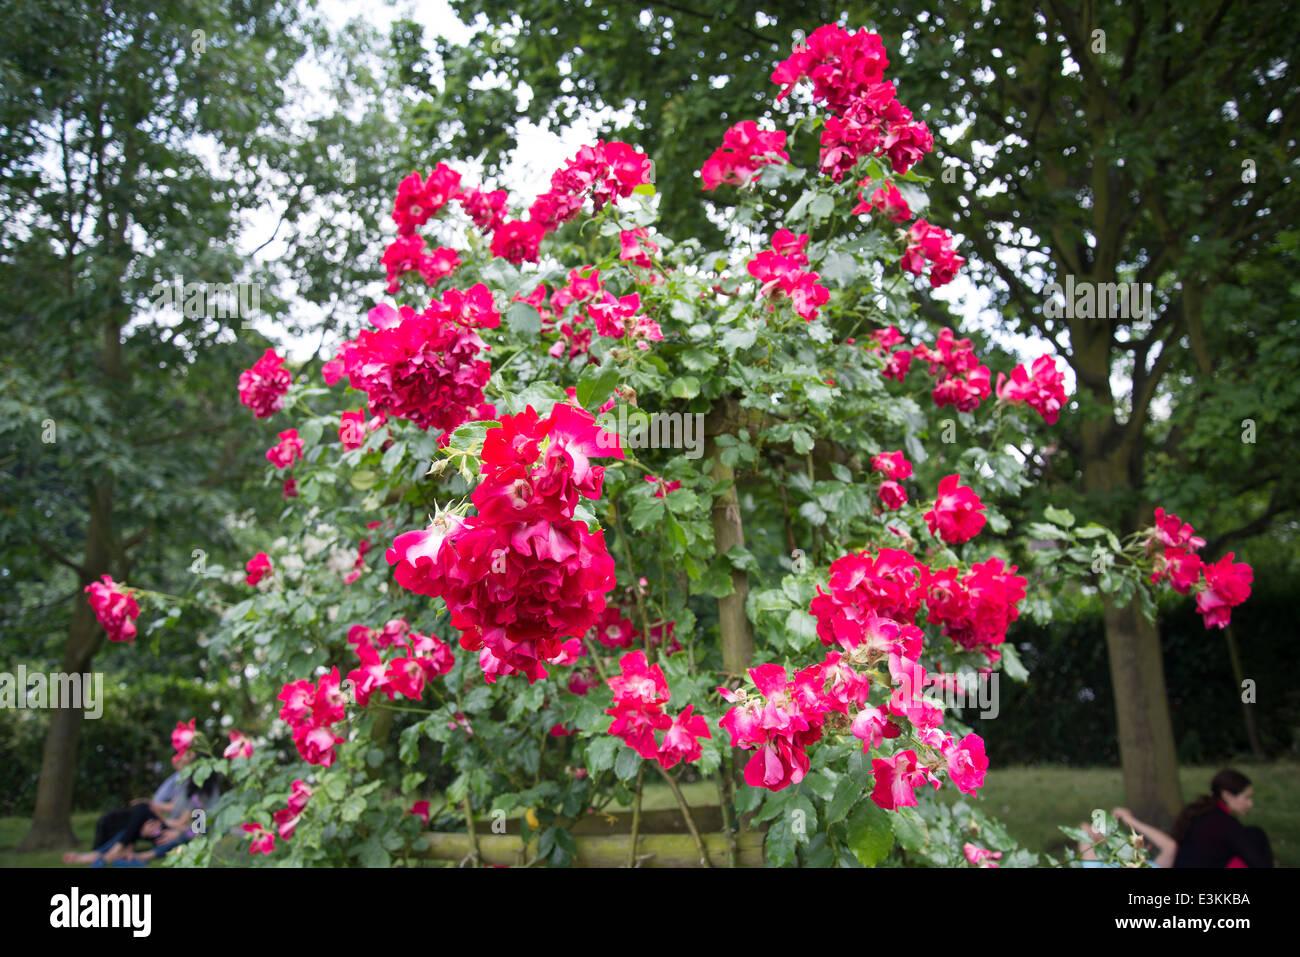 Rose 'Dortmund', climber - Stock Image